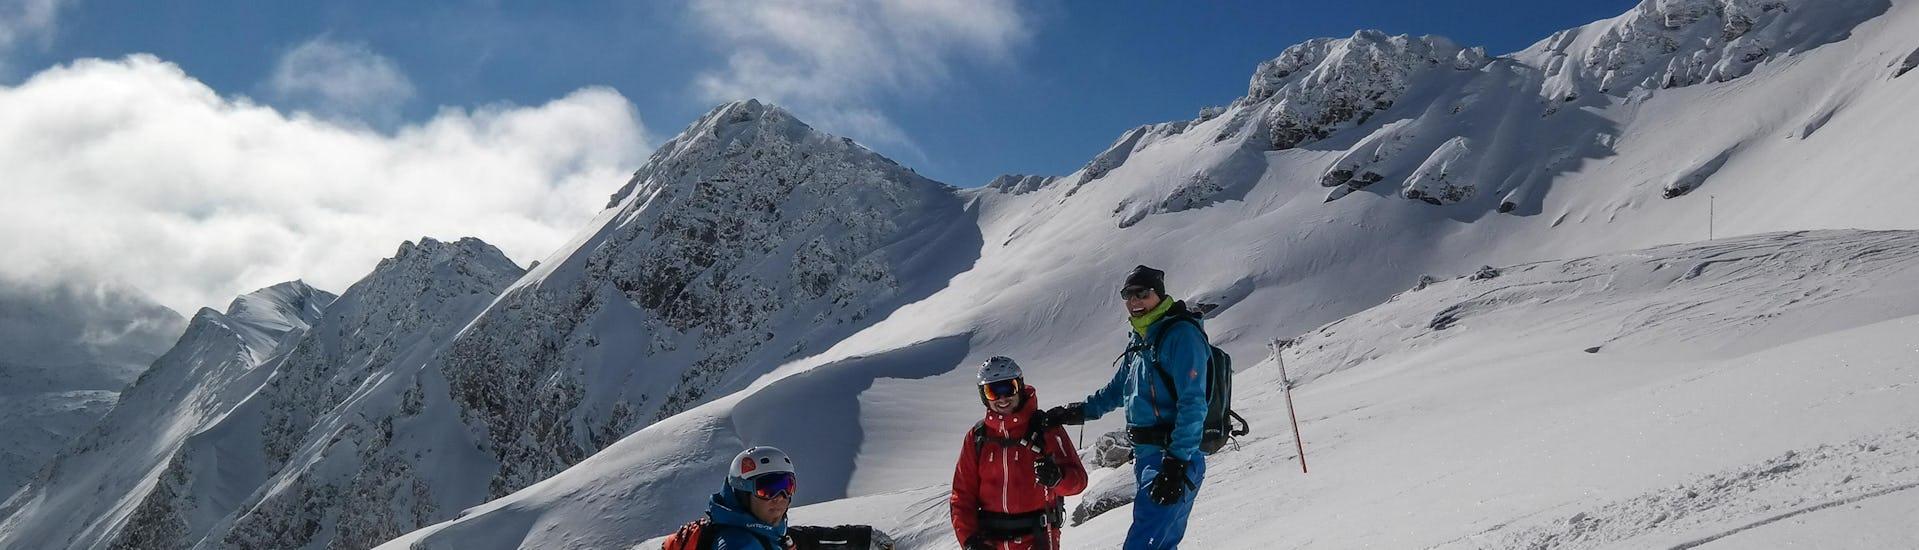 Skitour Privat - Alle Levels & Altersgruppen